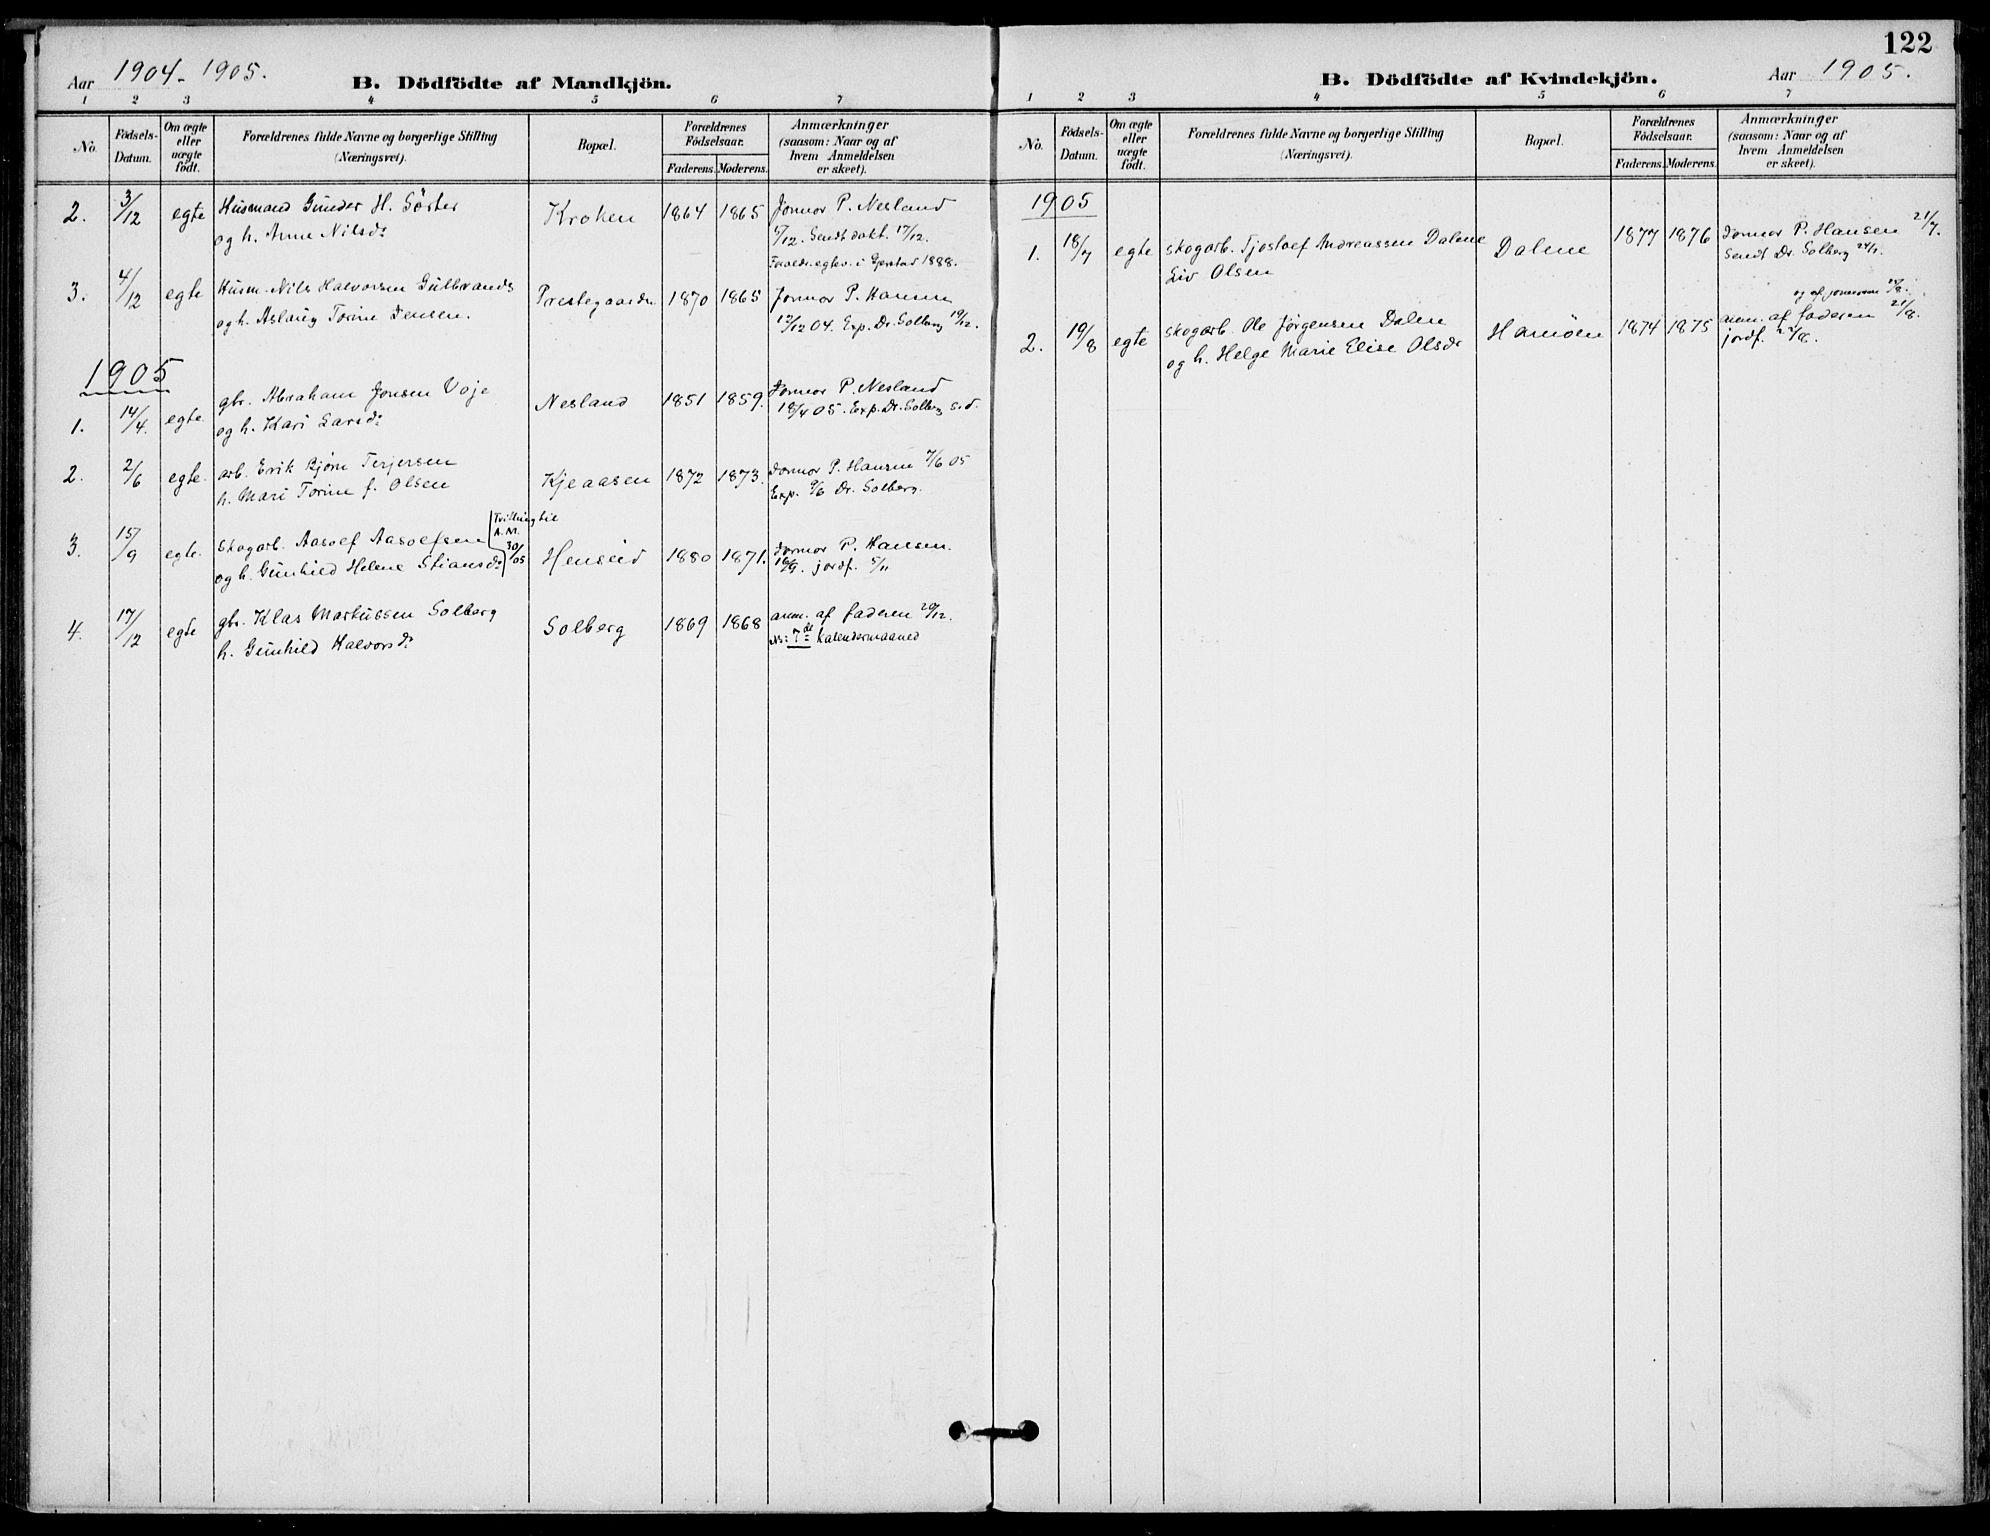 SAKO, Drangedal kirkebøker, F/Fa/L0012: Ministerialbok nr. 12, 1895-1905, s. 122